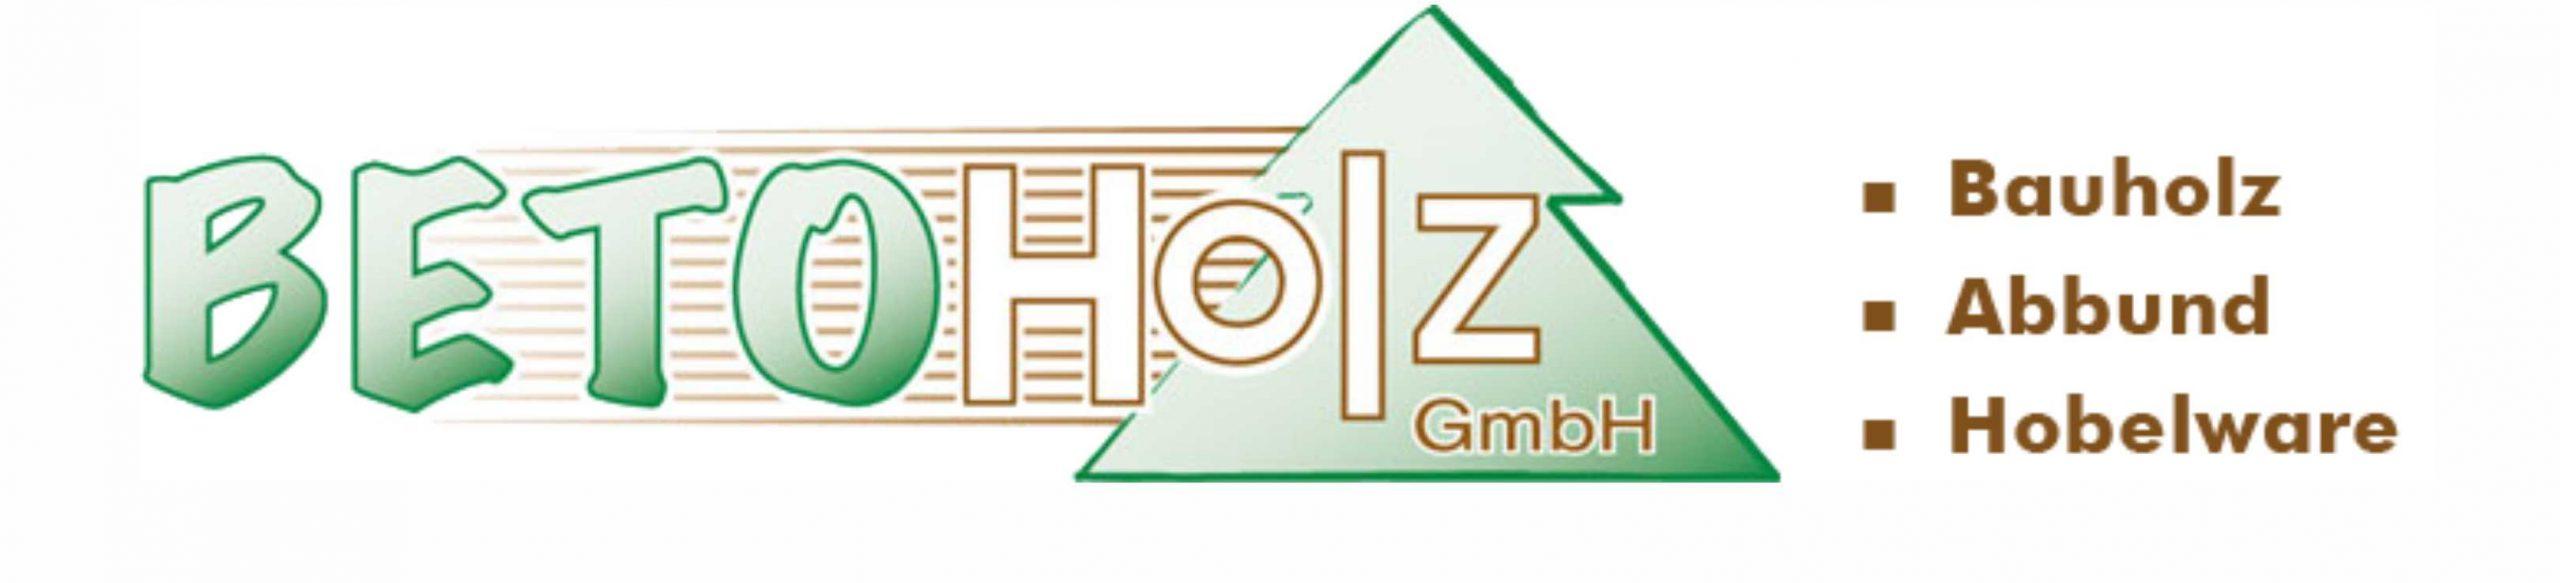 BETOHOLZ GmbH Oebisfelde Holz- und Baustoffmarkt - Oebisfelde